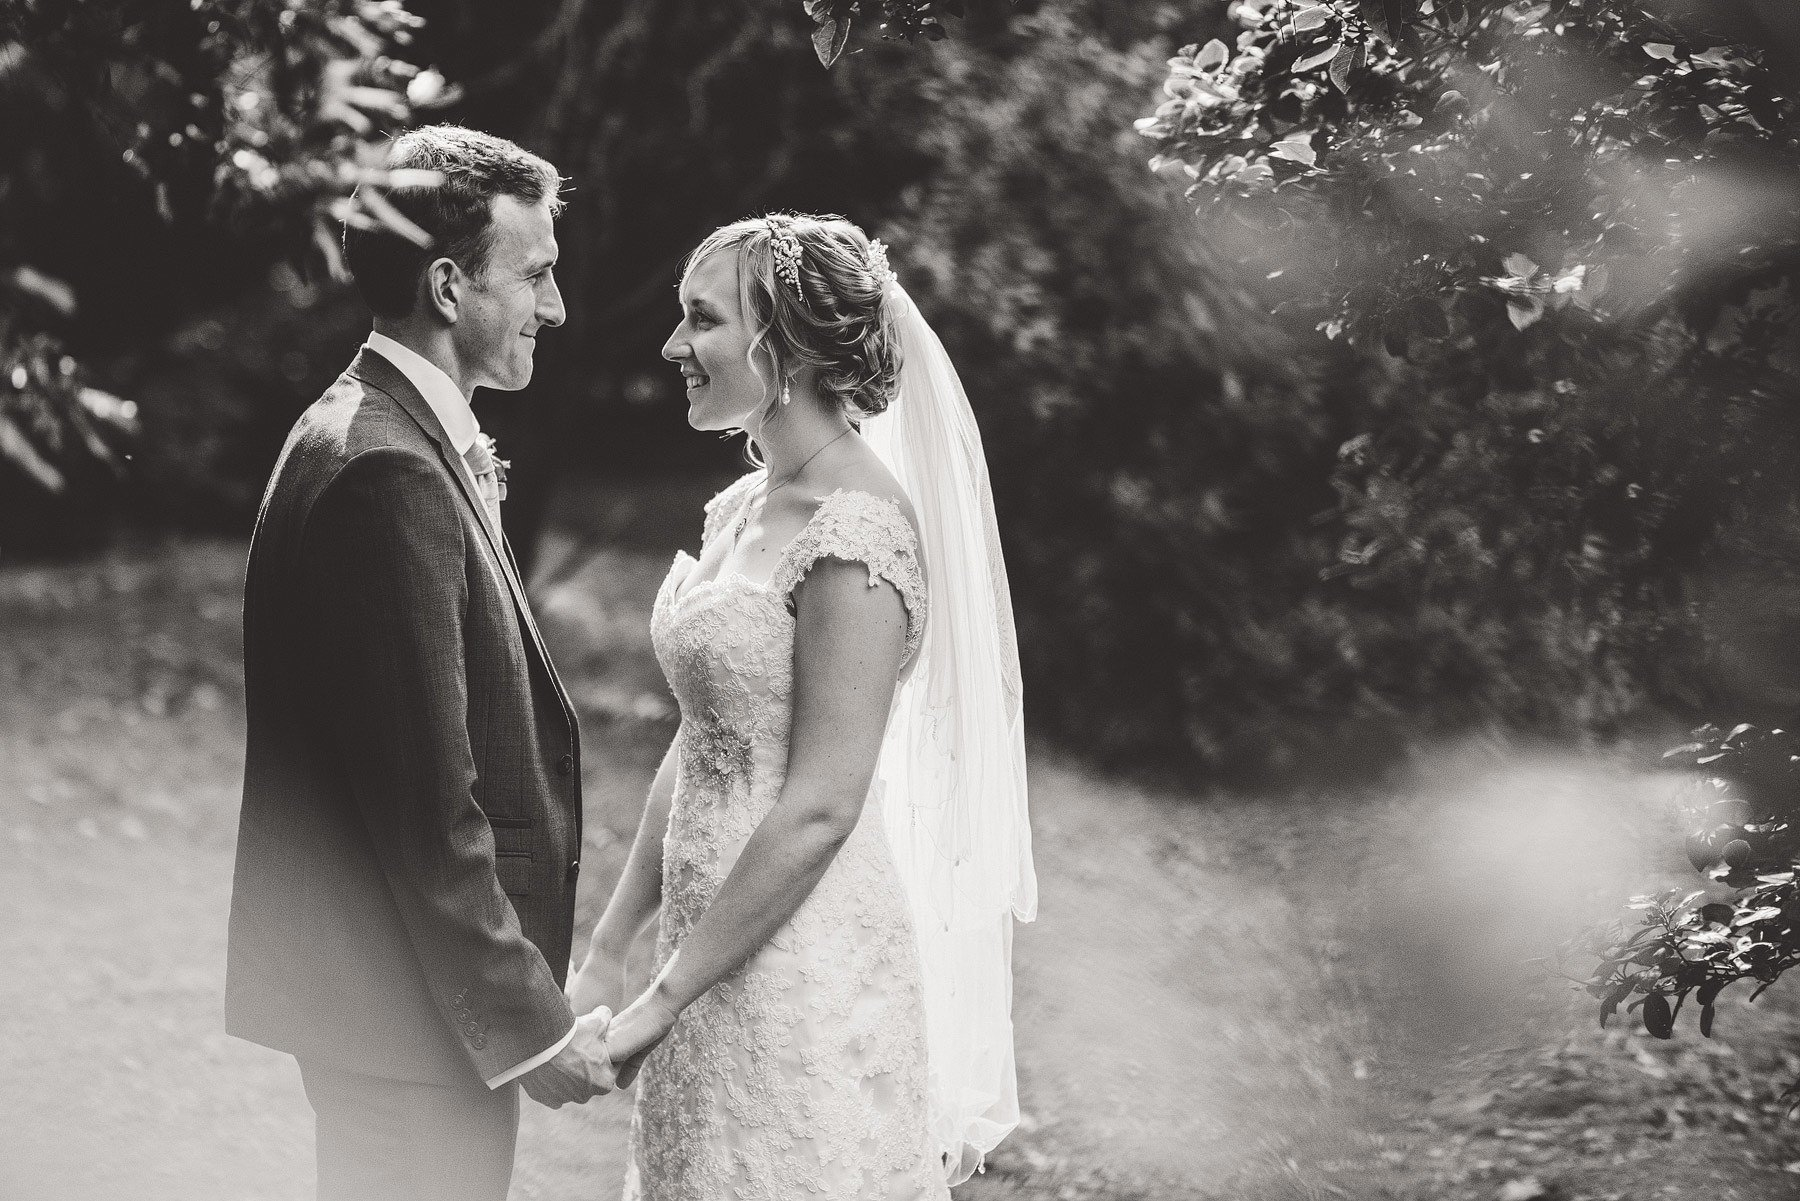 Old Down Manor wedding photographer